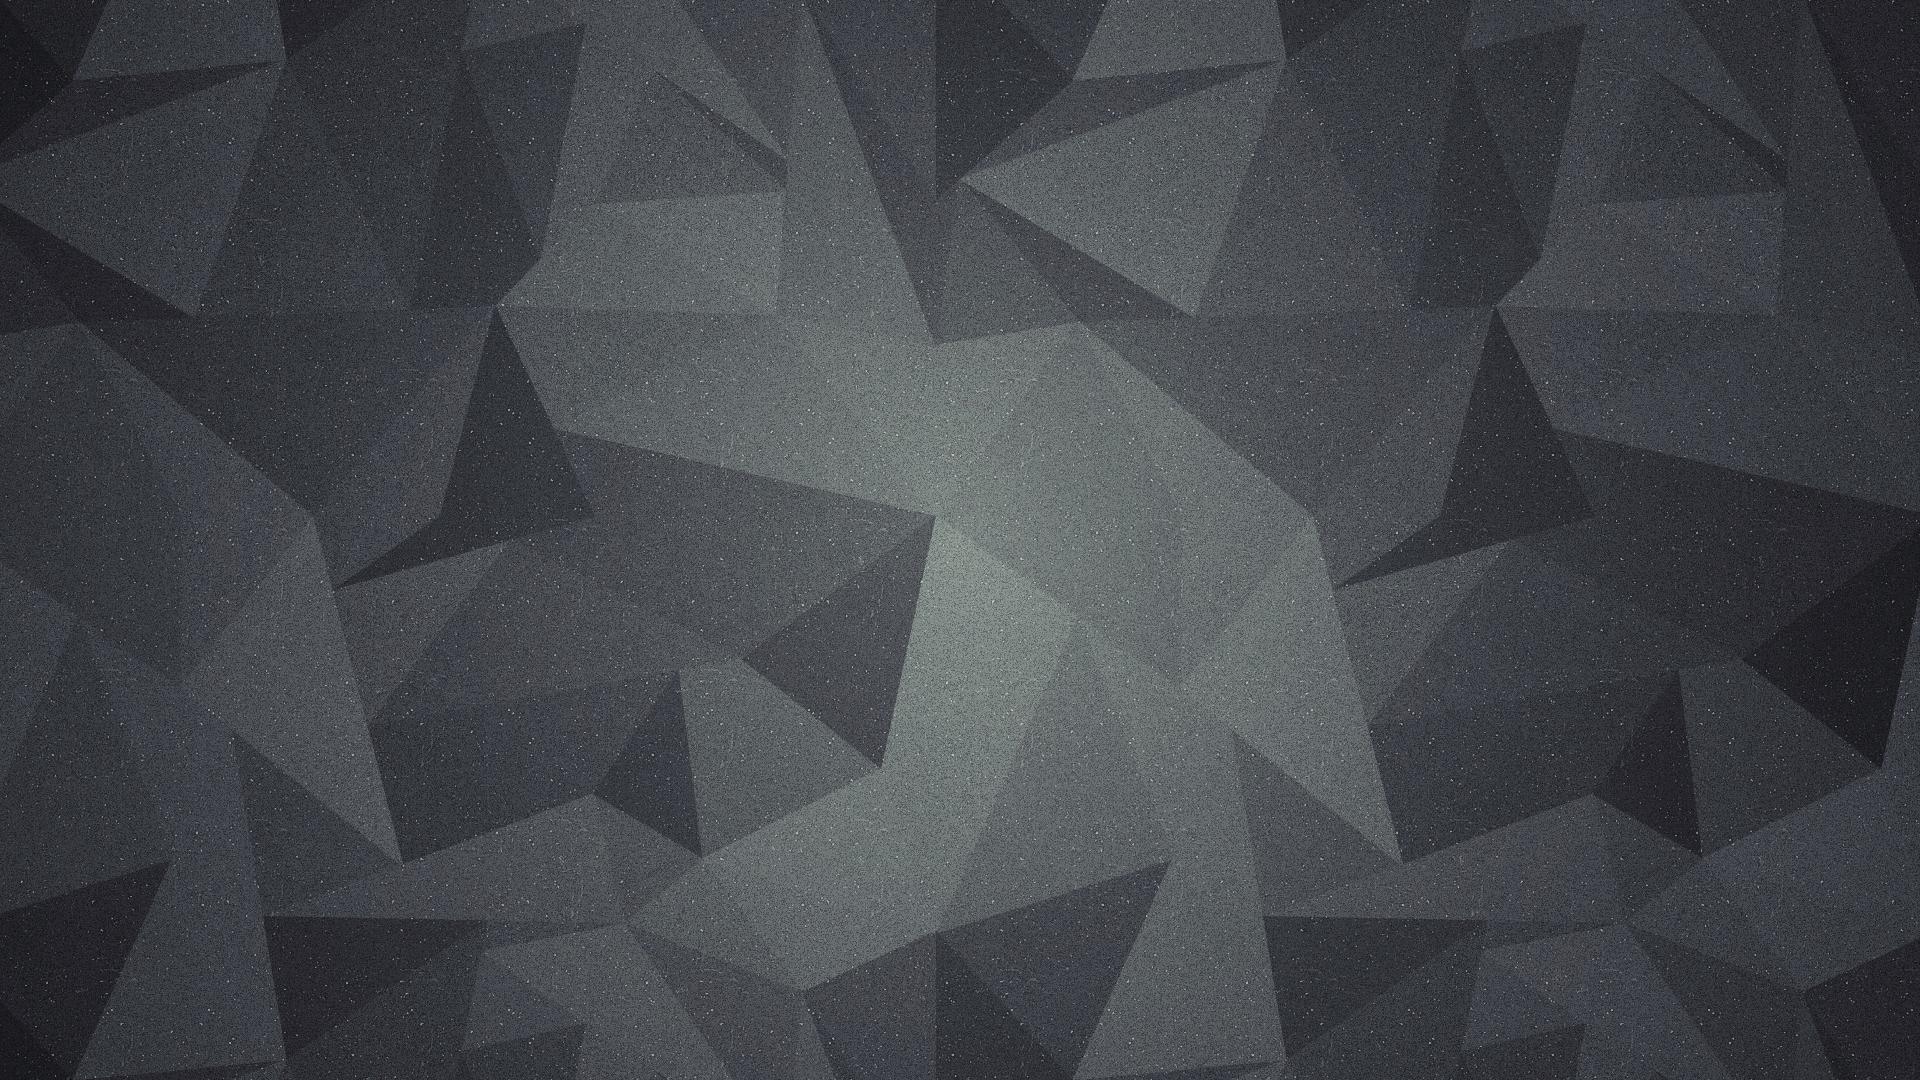 abstract wallpapers shapes geometric wallpaper desktop 1920x1080 1920x1080